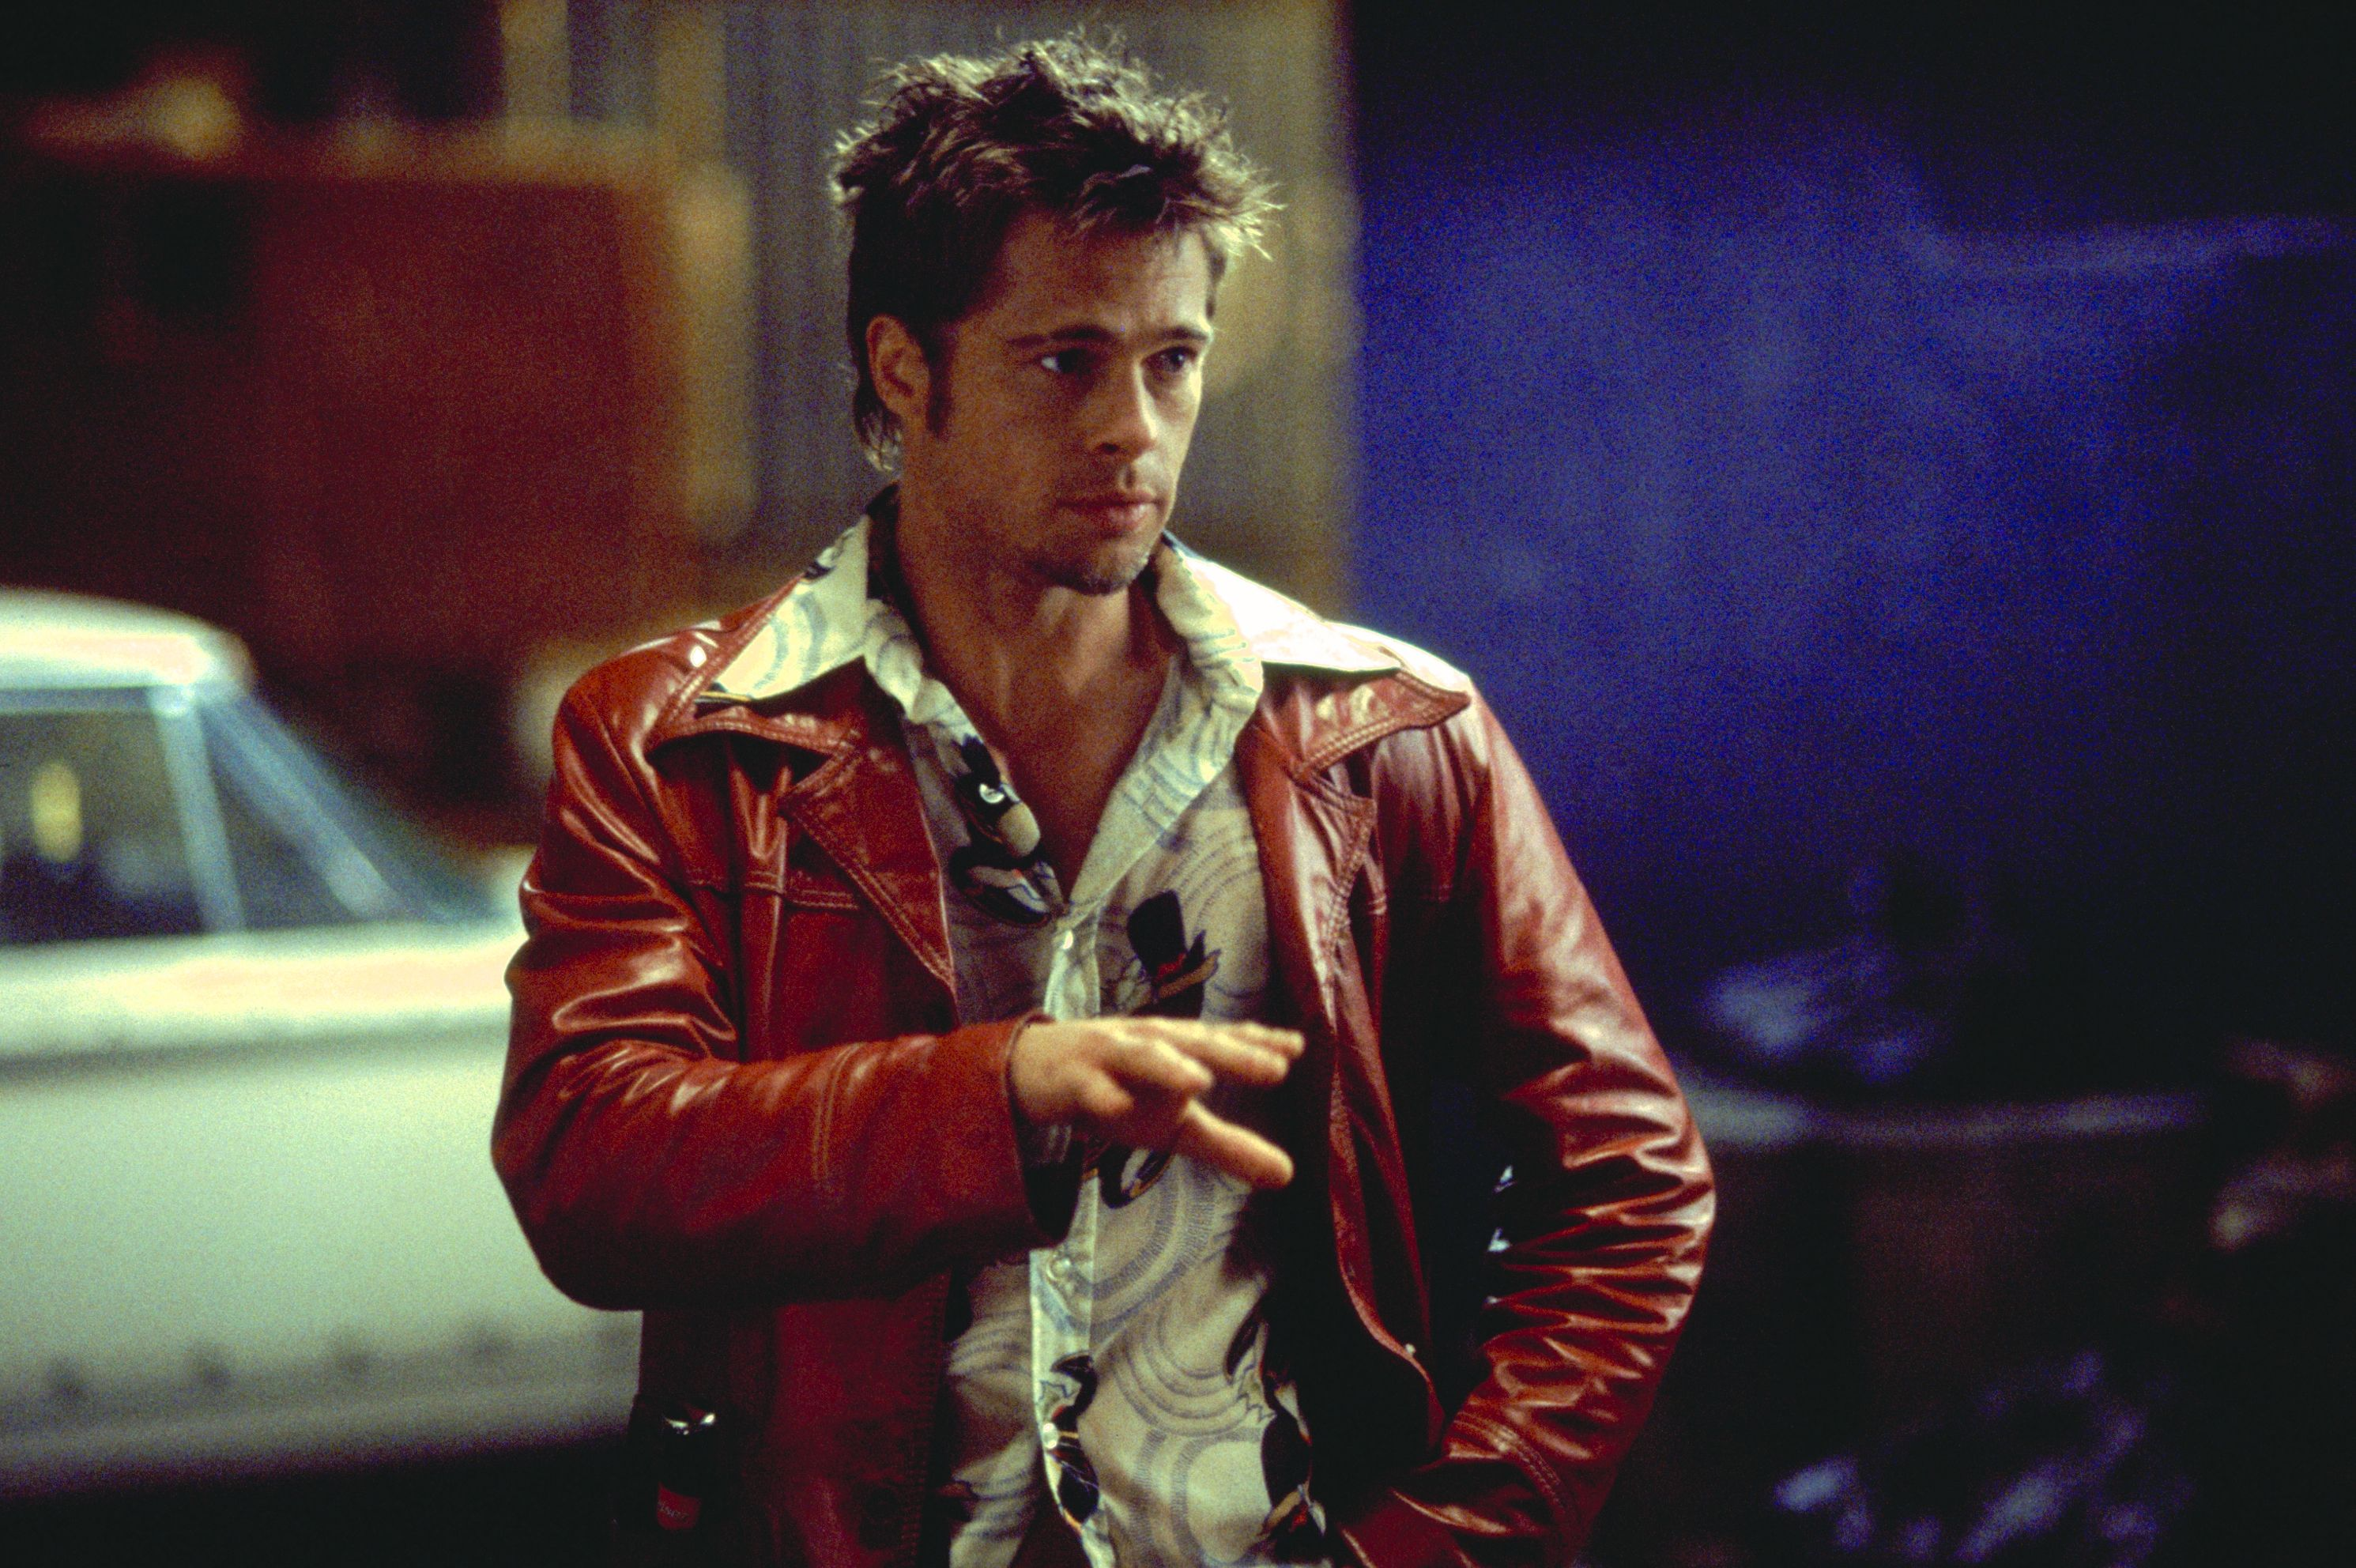 The best Brad Pitt films of all time